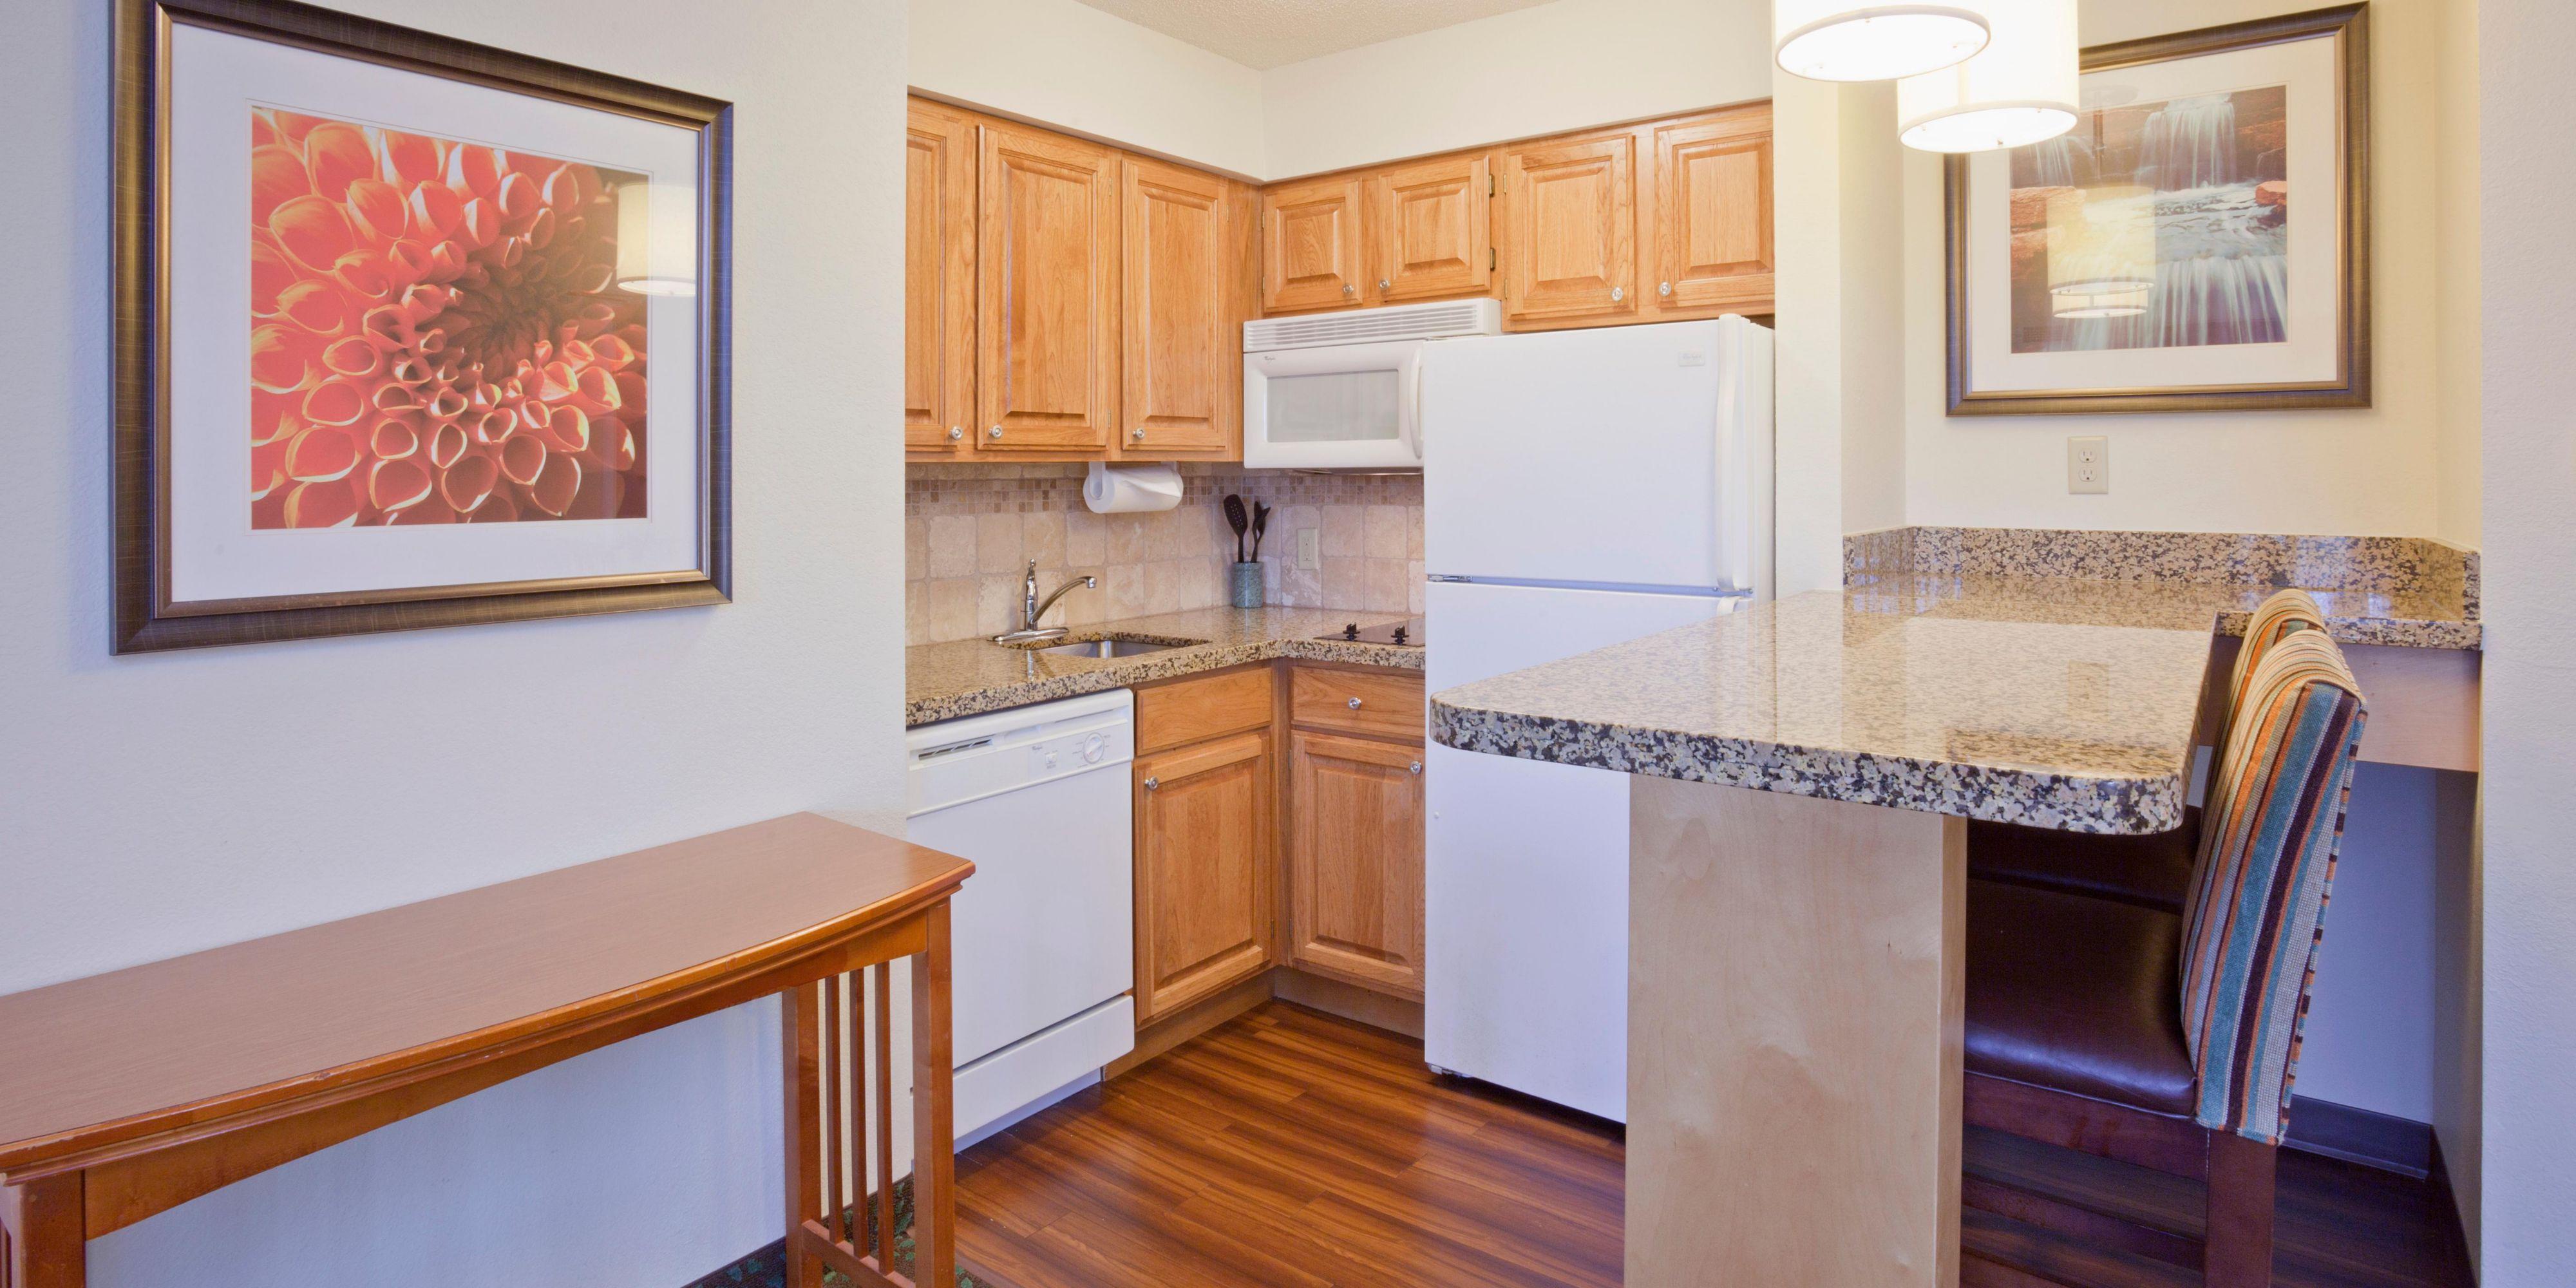 ... Full Kitchens W/ Toaster/microwave/stove/fridge/freezer ...